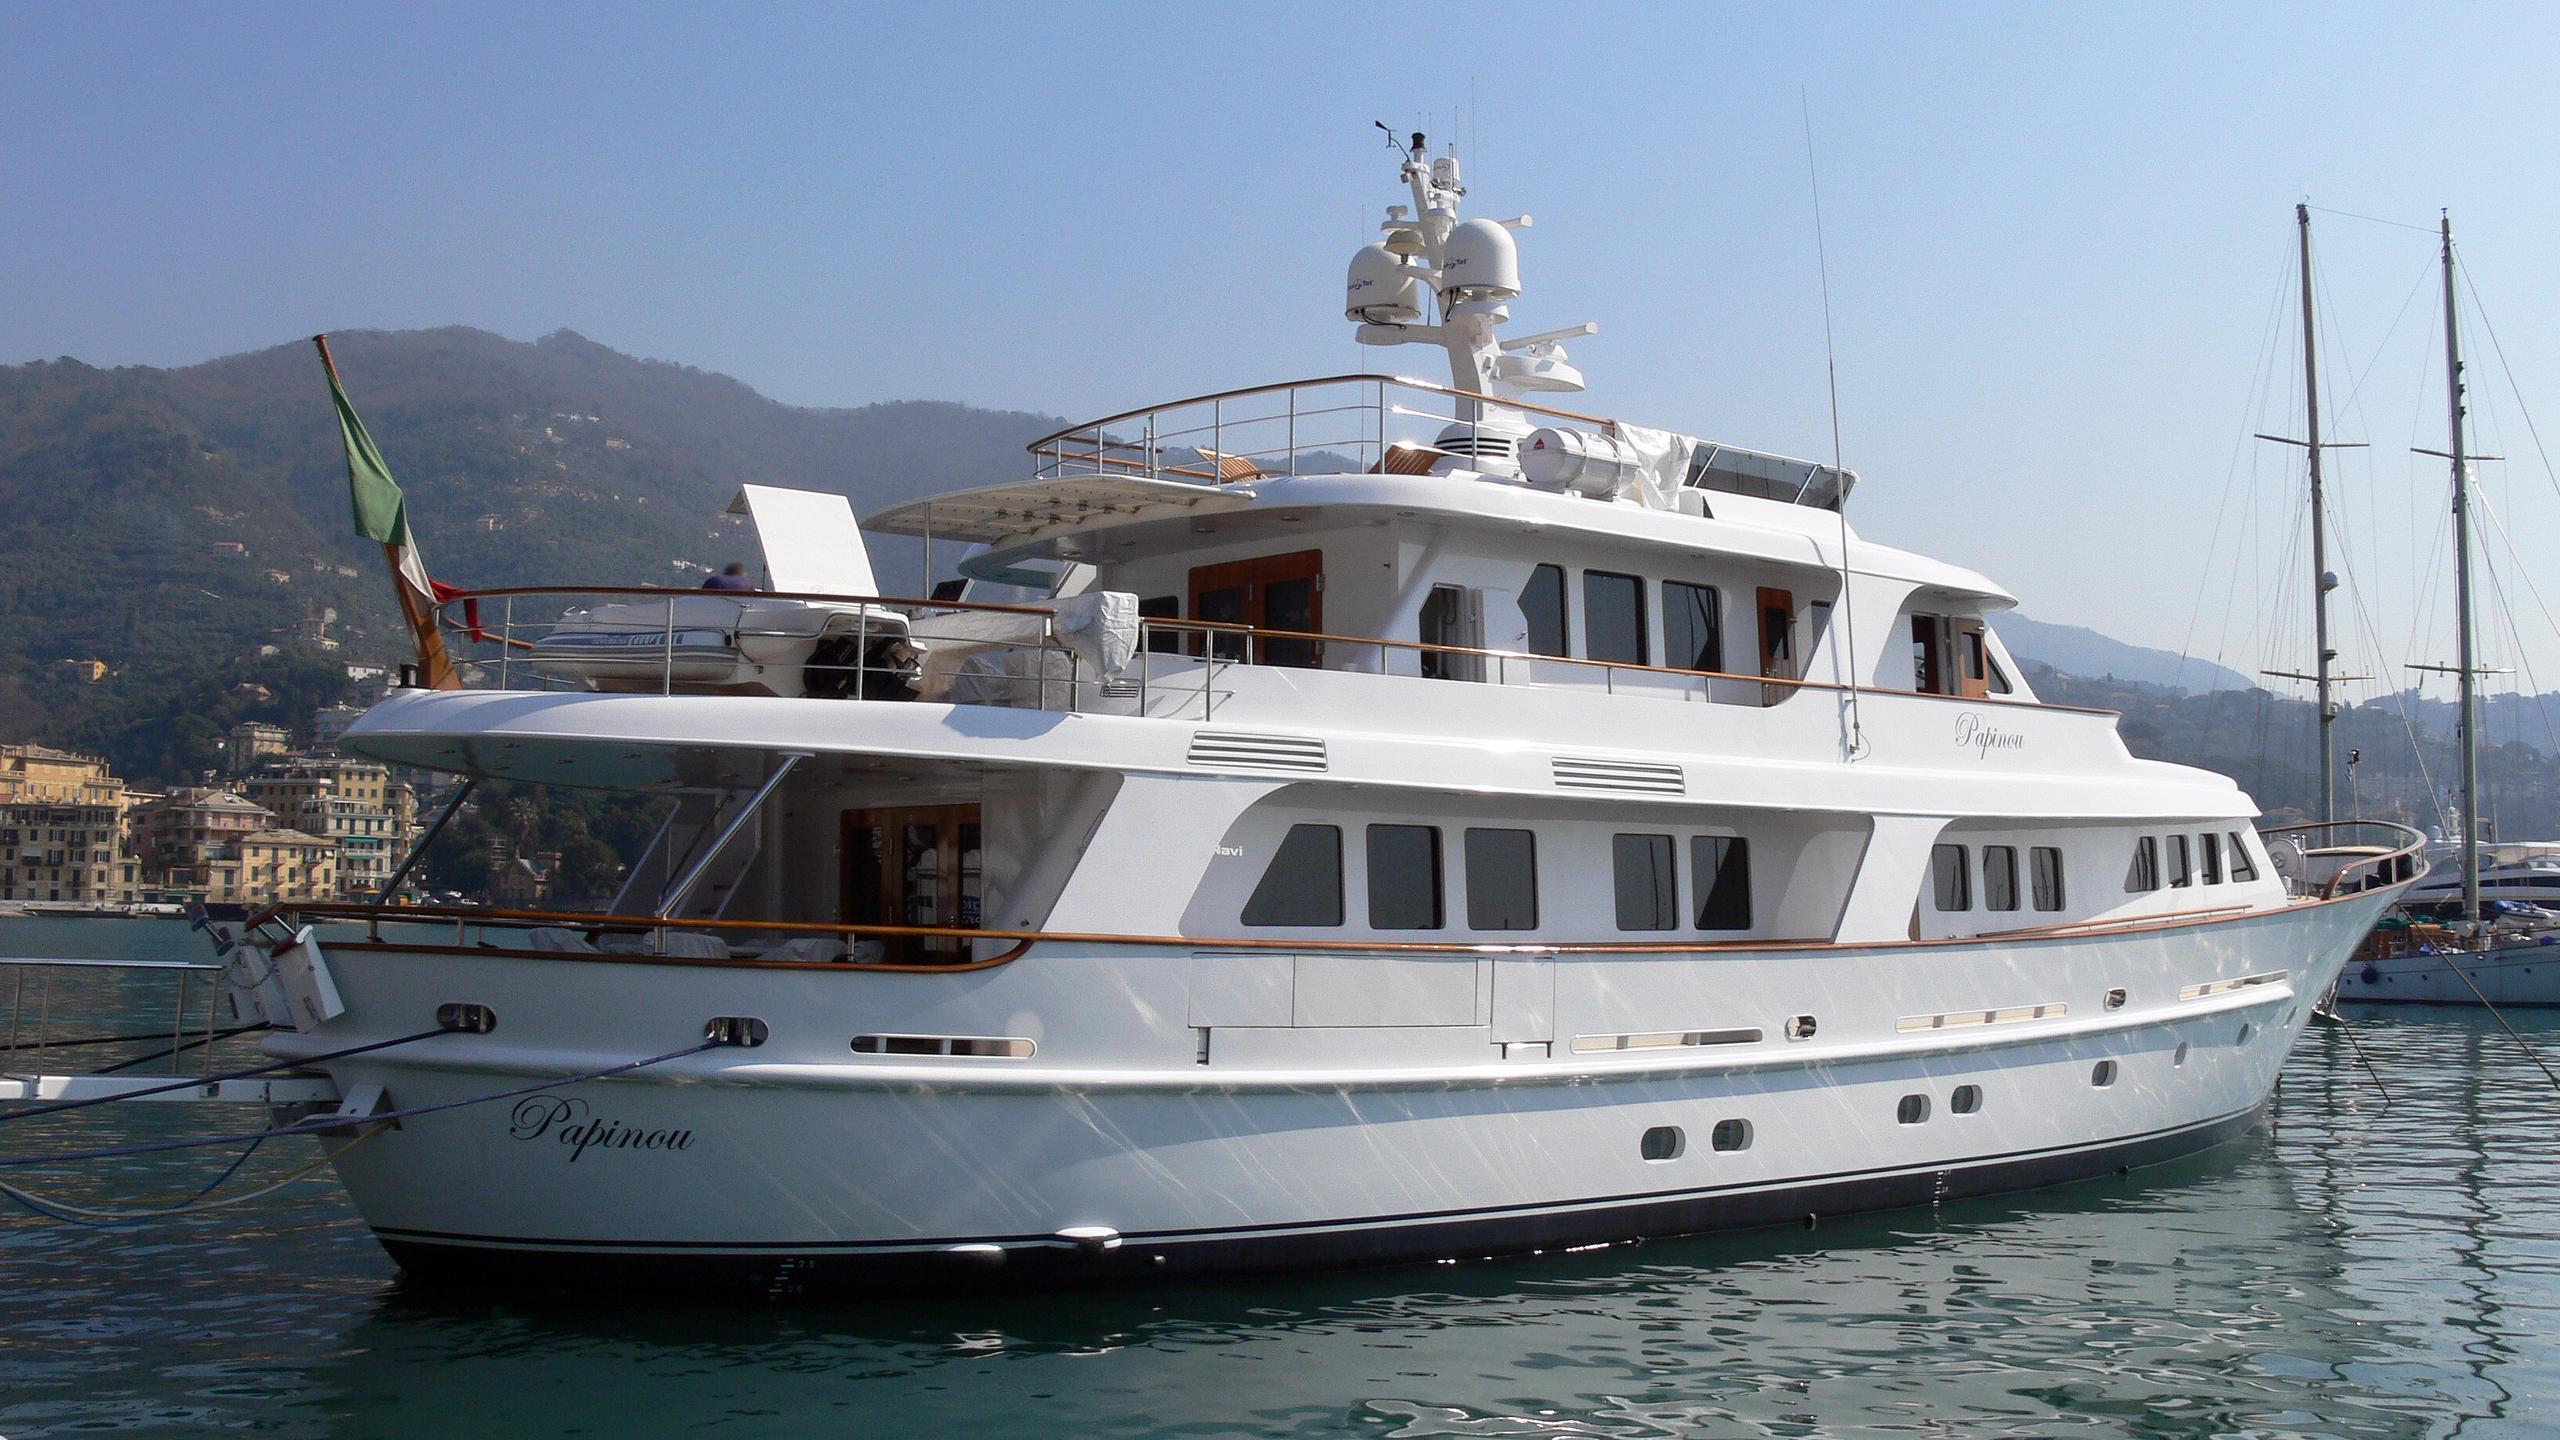 papinou-motor-yacht-cbi-navi-2004-34m-stern